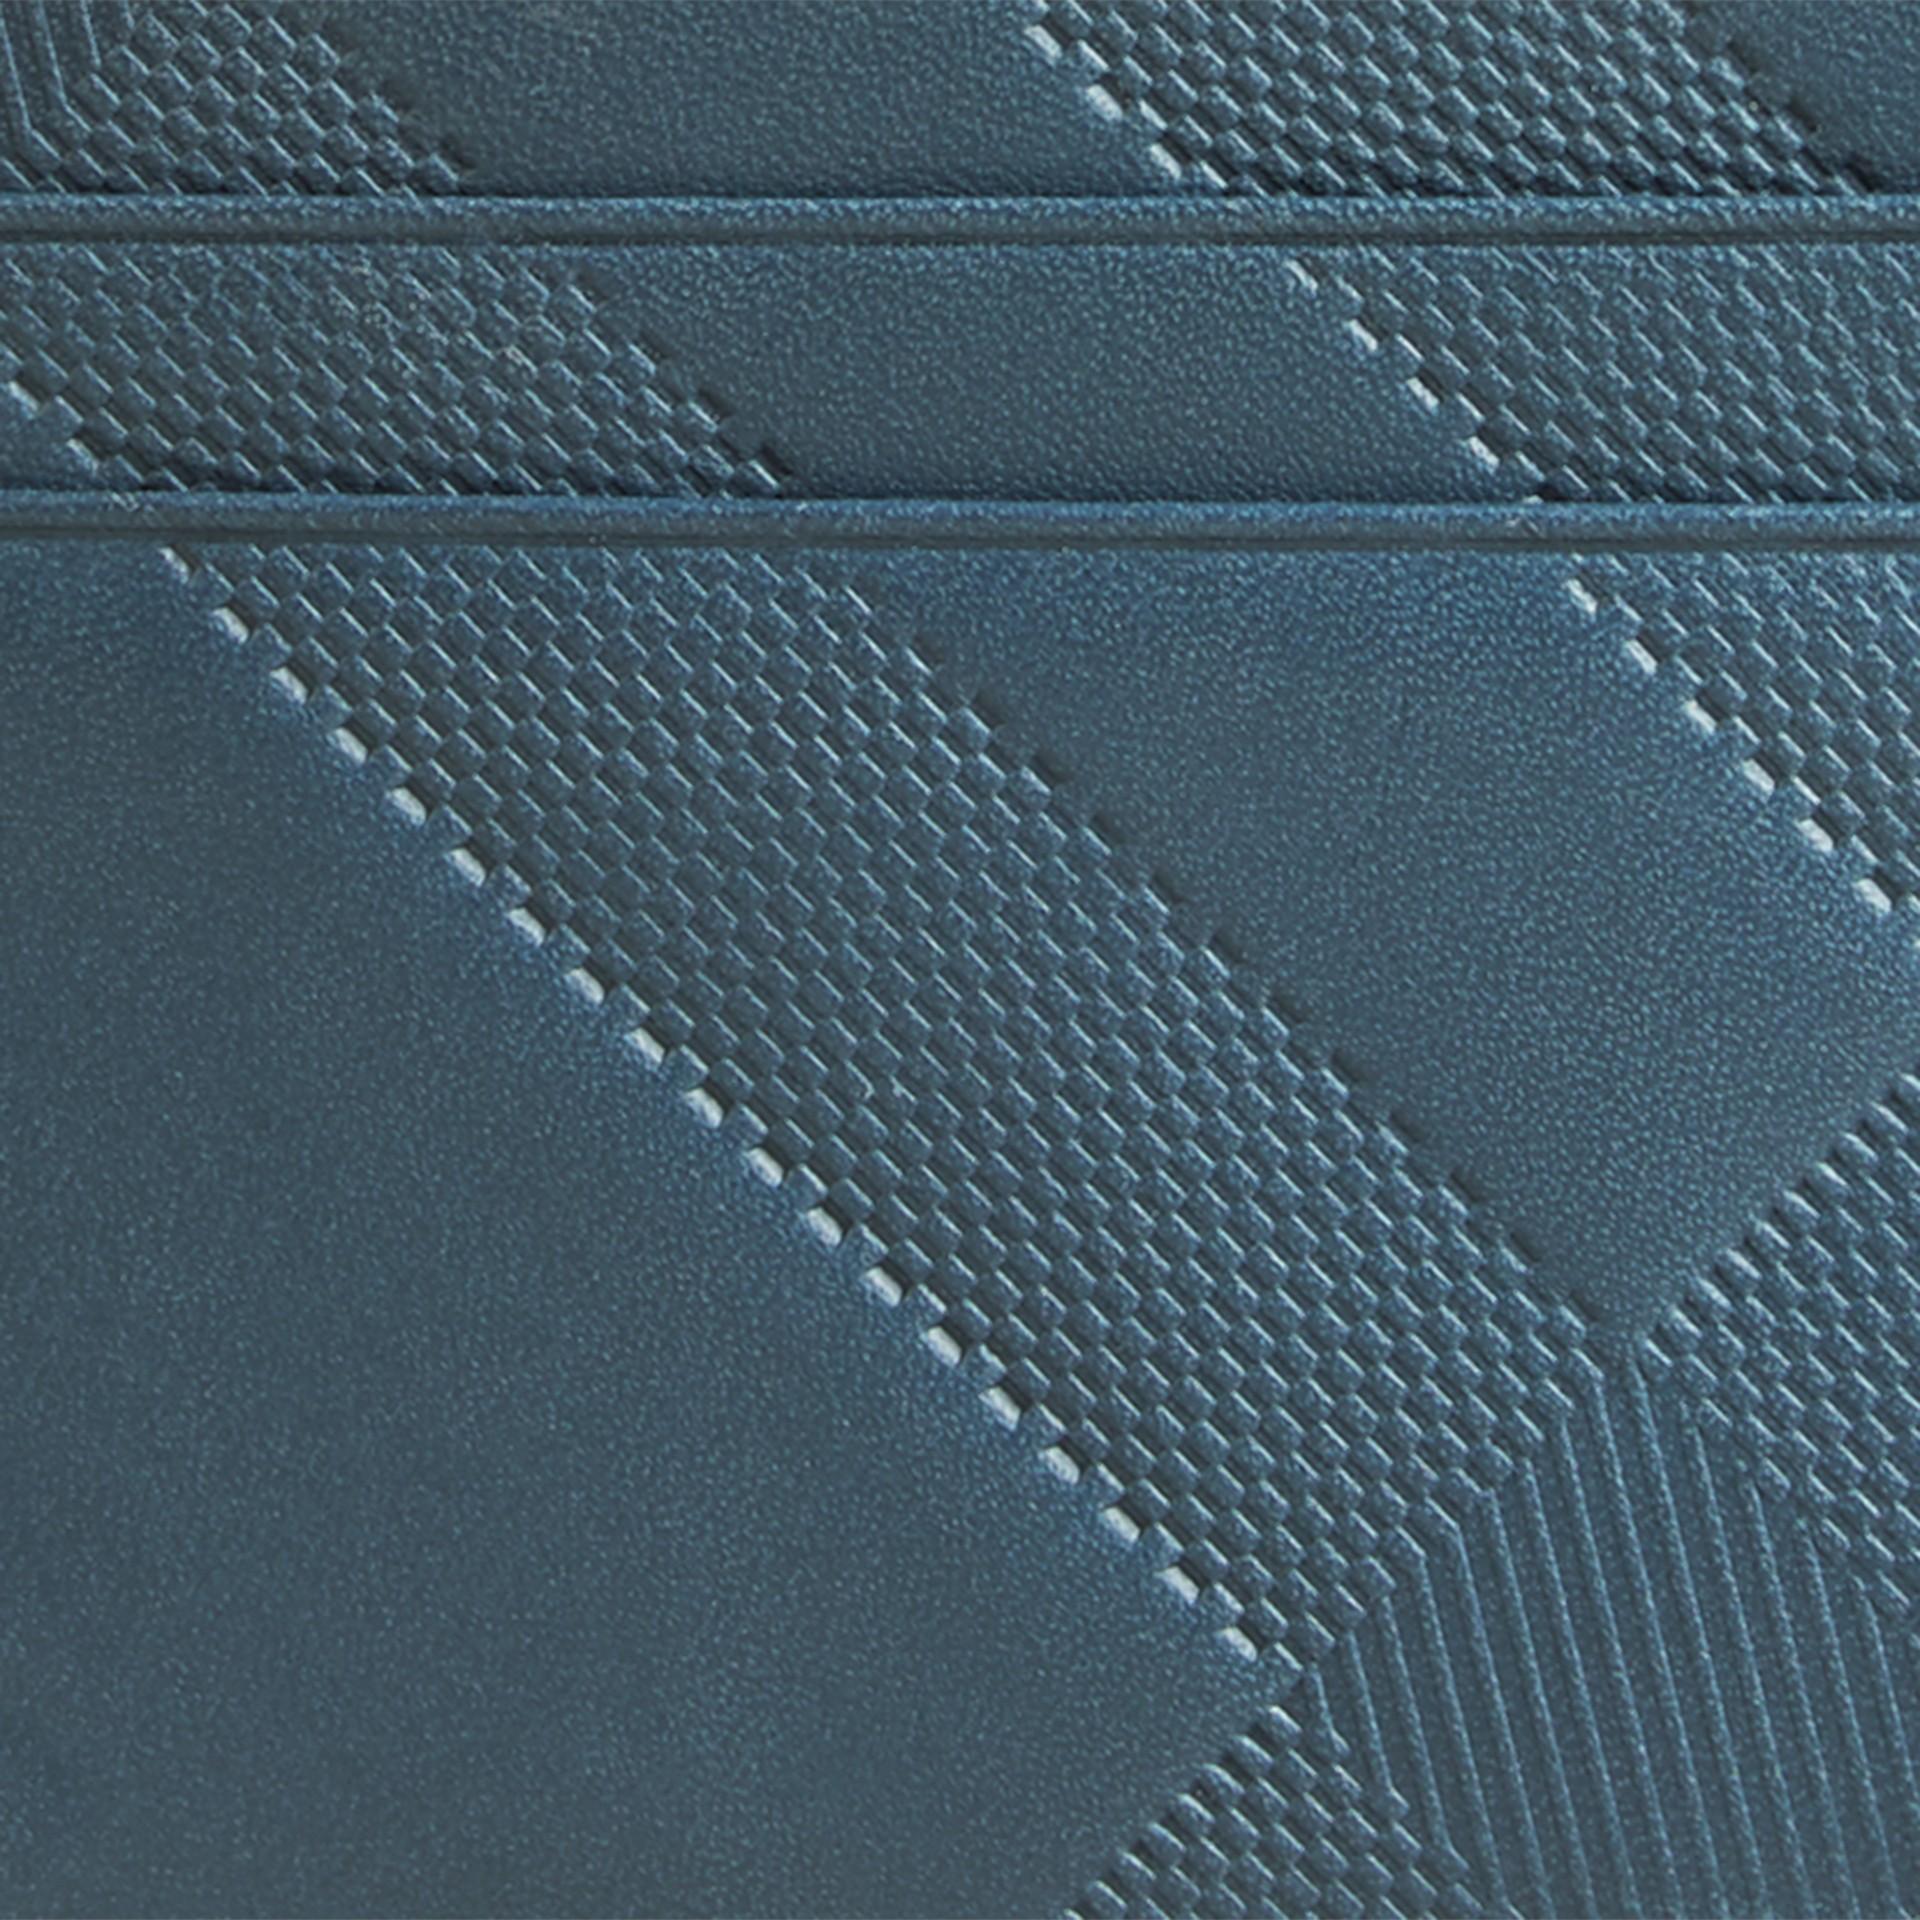 Bleu acier Porte-cartes en cuir à motif check en relief Bleu Acier - photo de la galerie 2